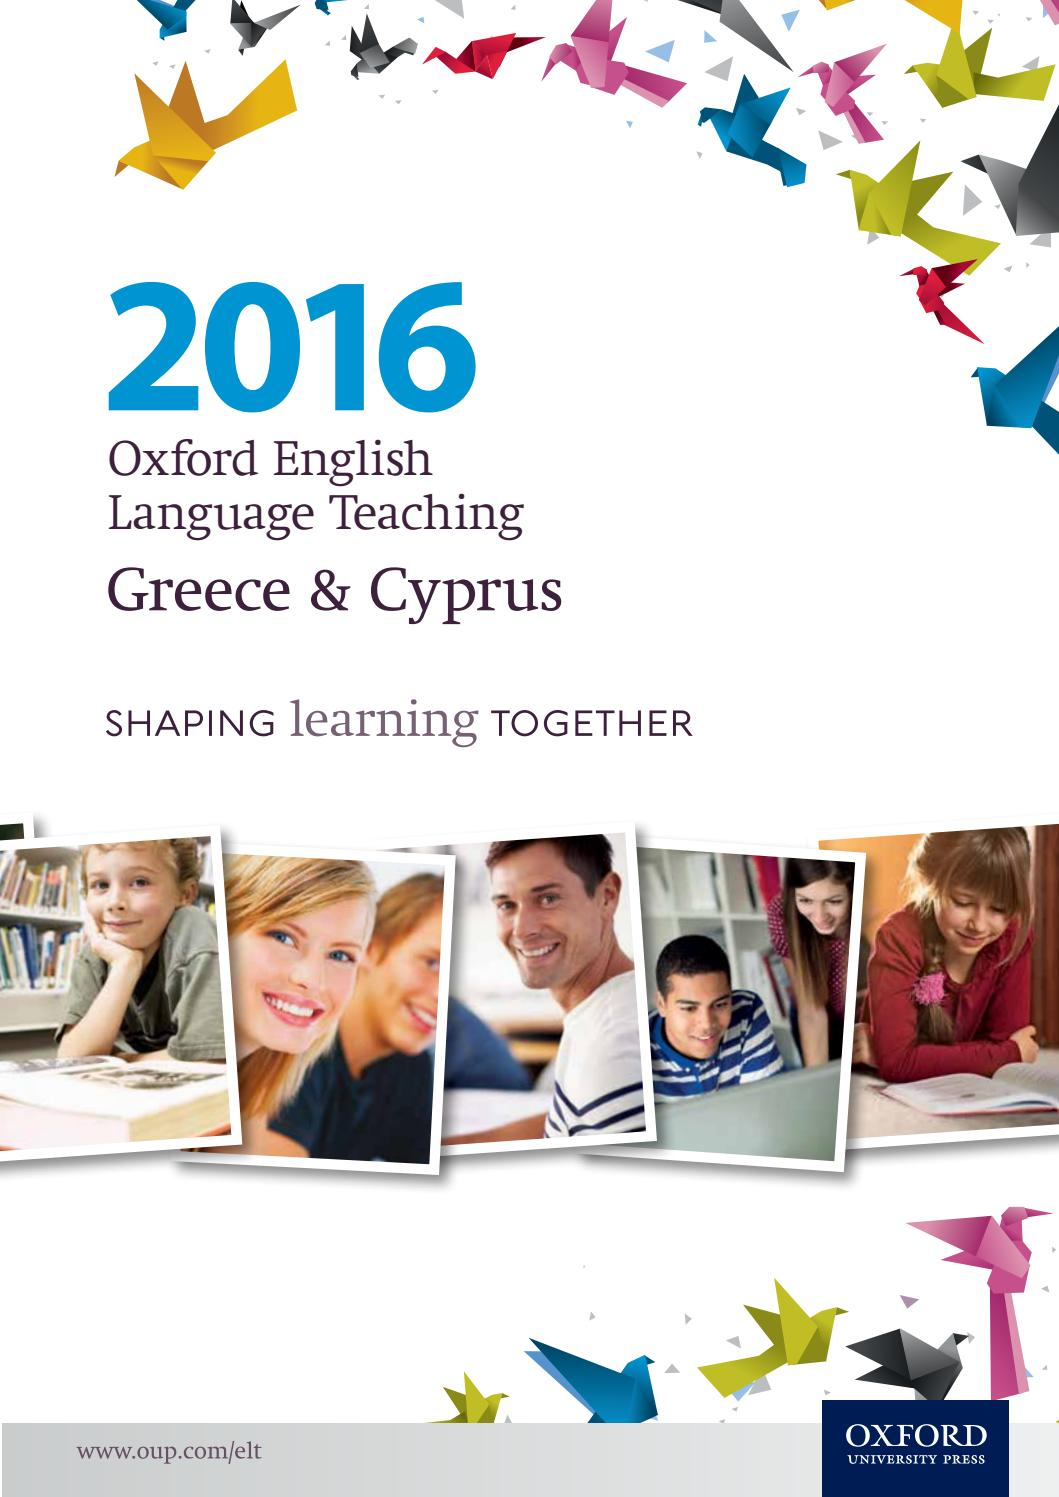 Oxford university press 2016 by Kostas Nitaf - issuu